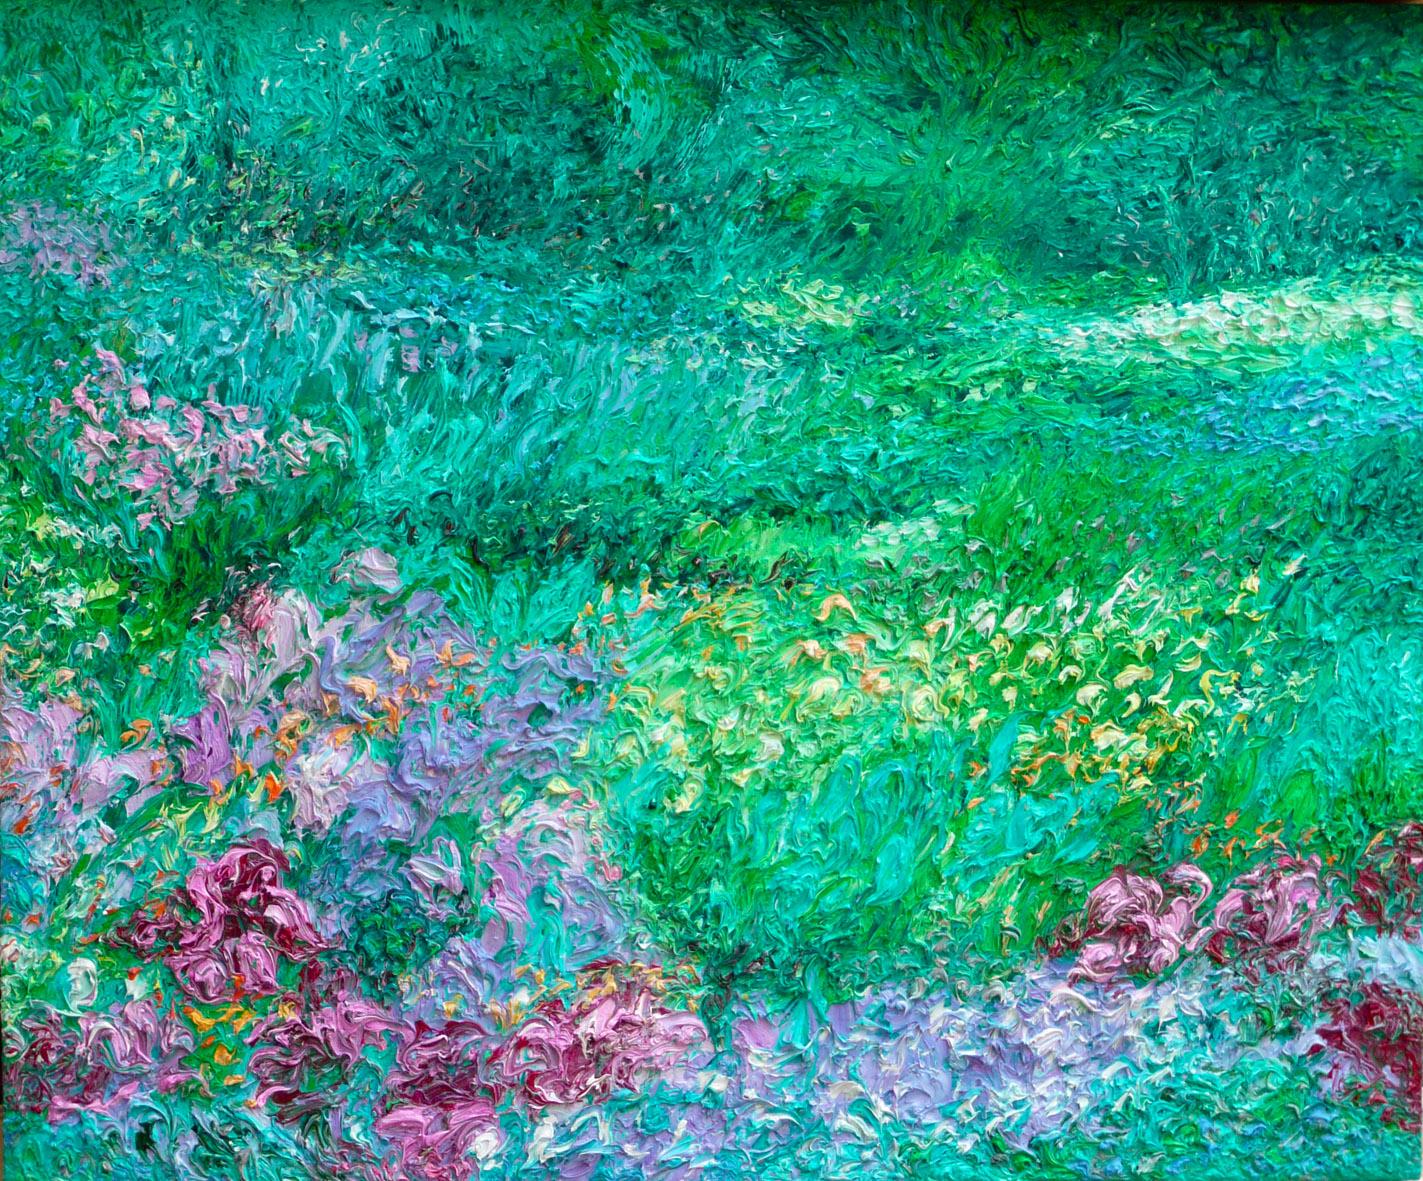 Ansgar Skiba, Garden, 2009, oil on canvas, 100 x 120 cm, courtesy of Galerie Seippel Köln.JPG